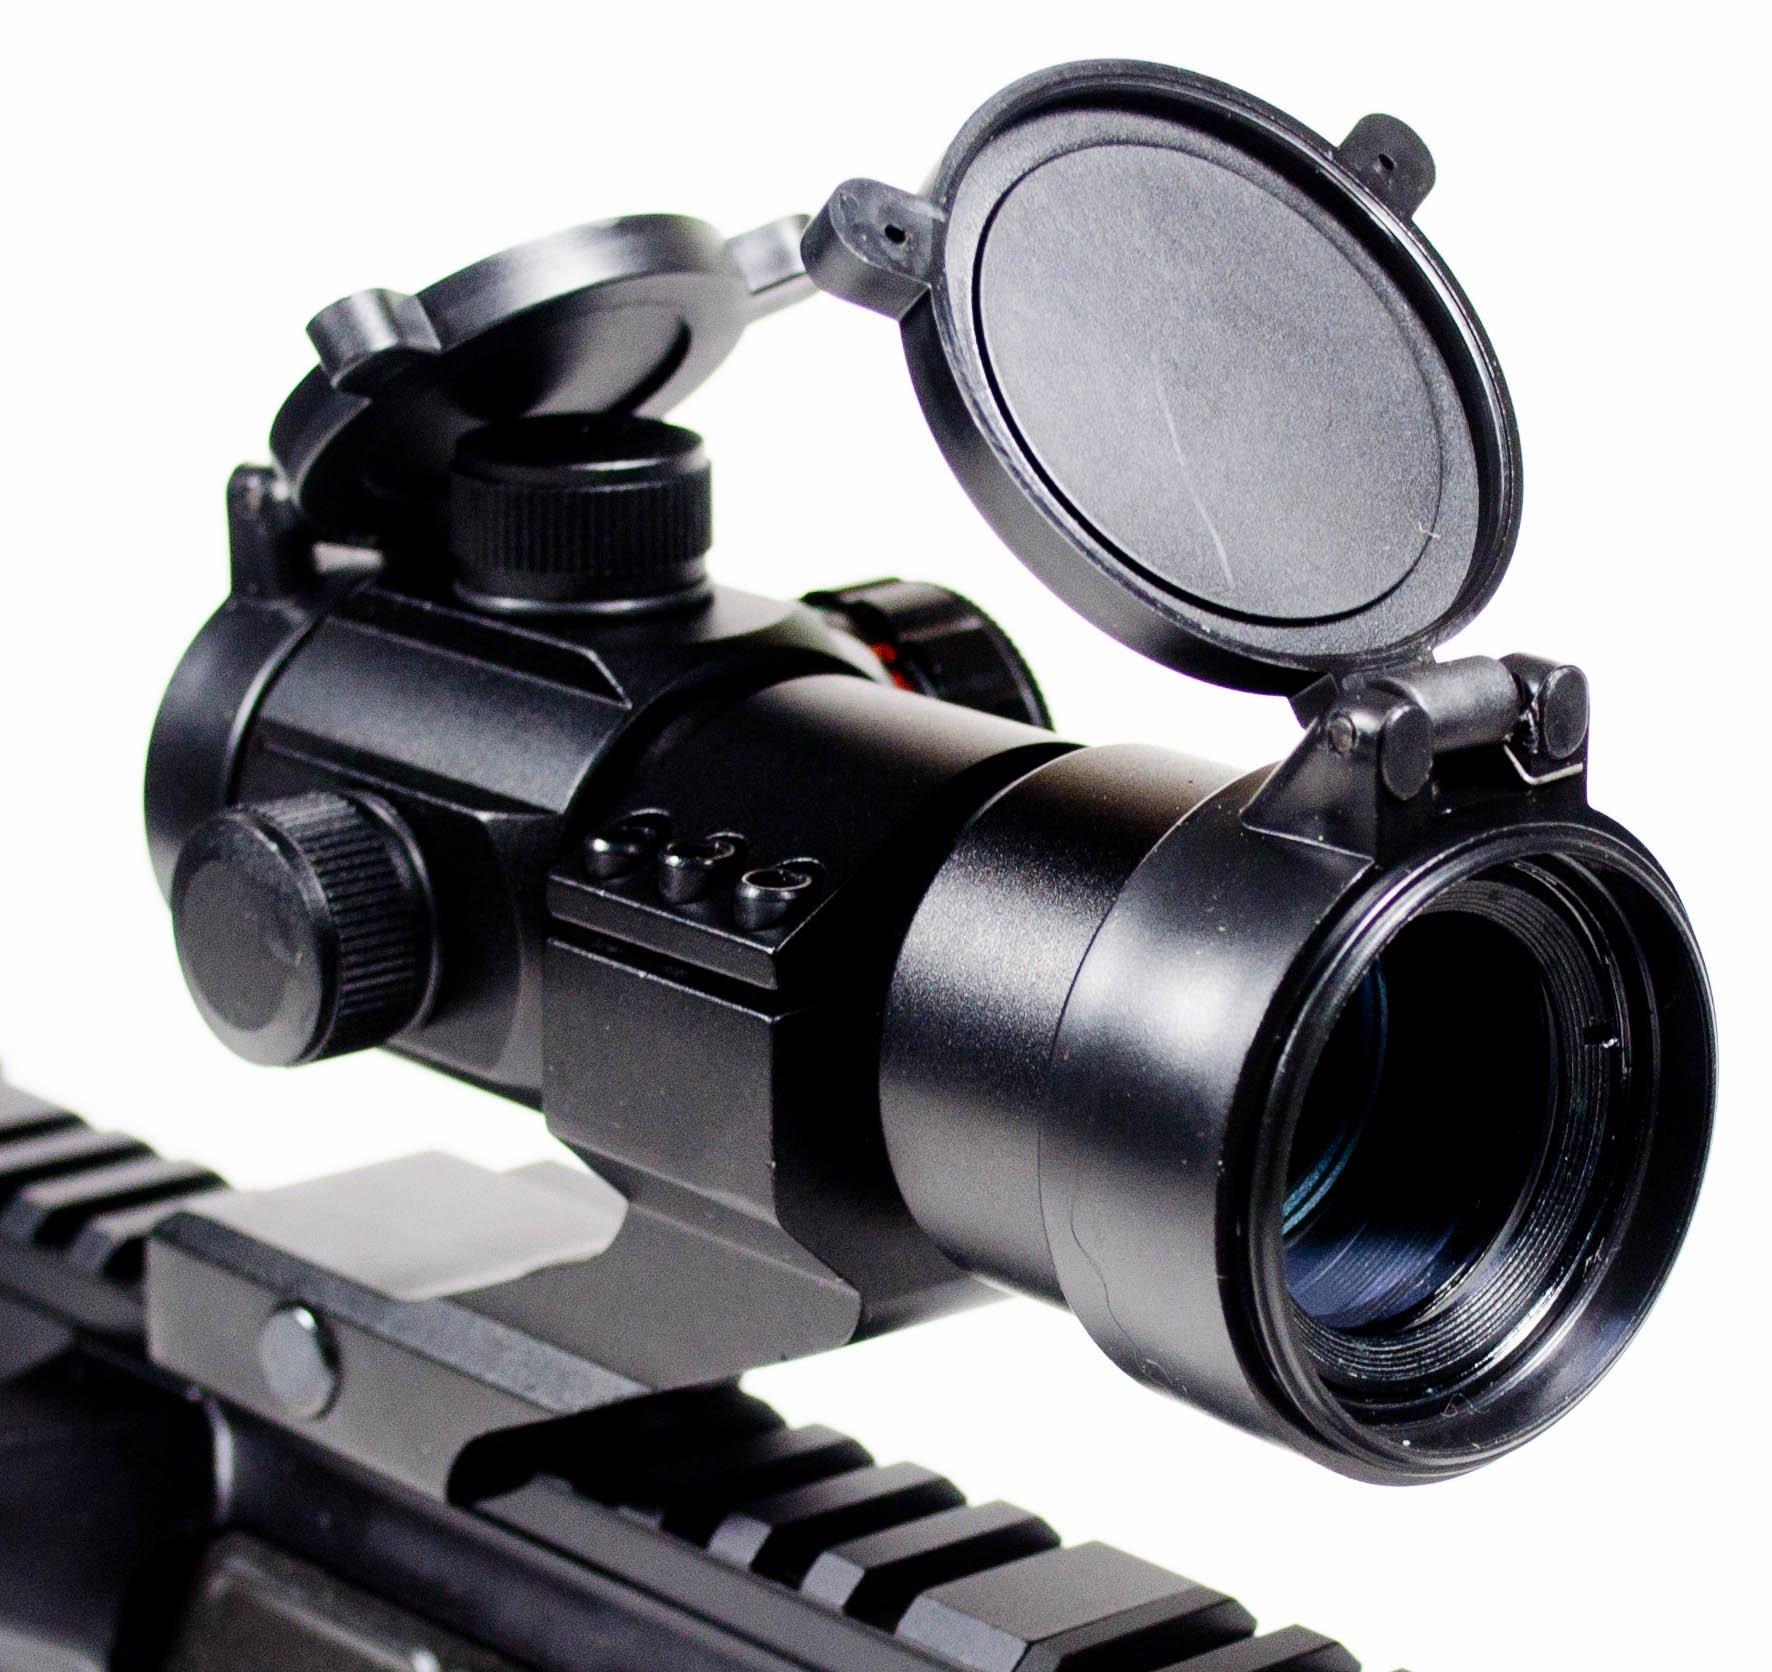 Ozark Armament Rhino Red Dot Sight - Green Dot Sight - Includes Picatinny Mount - Co-Witness - Reflex Rifle Sight by OZARK ARMAMENT